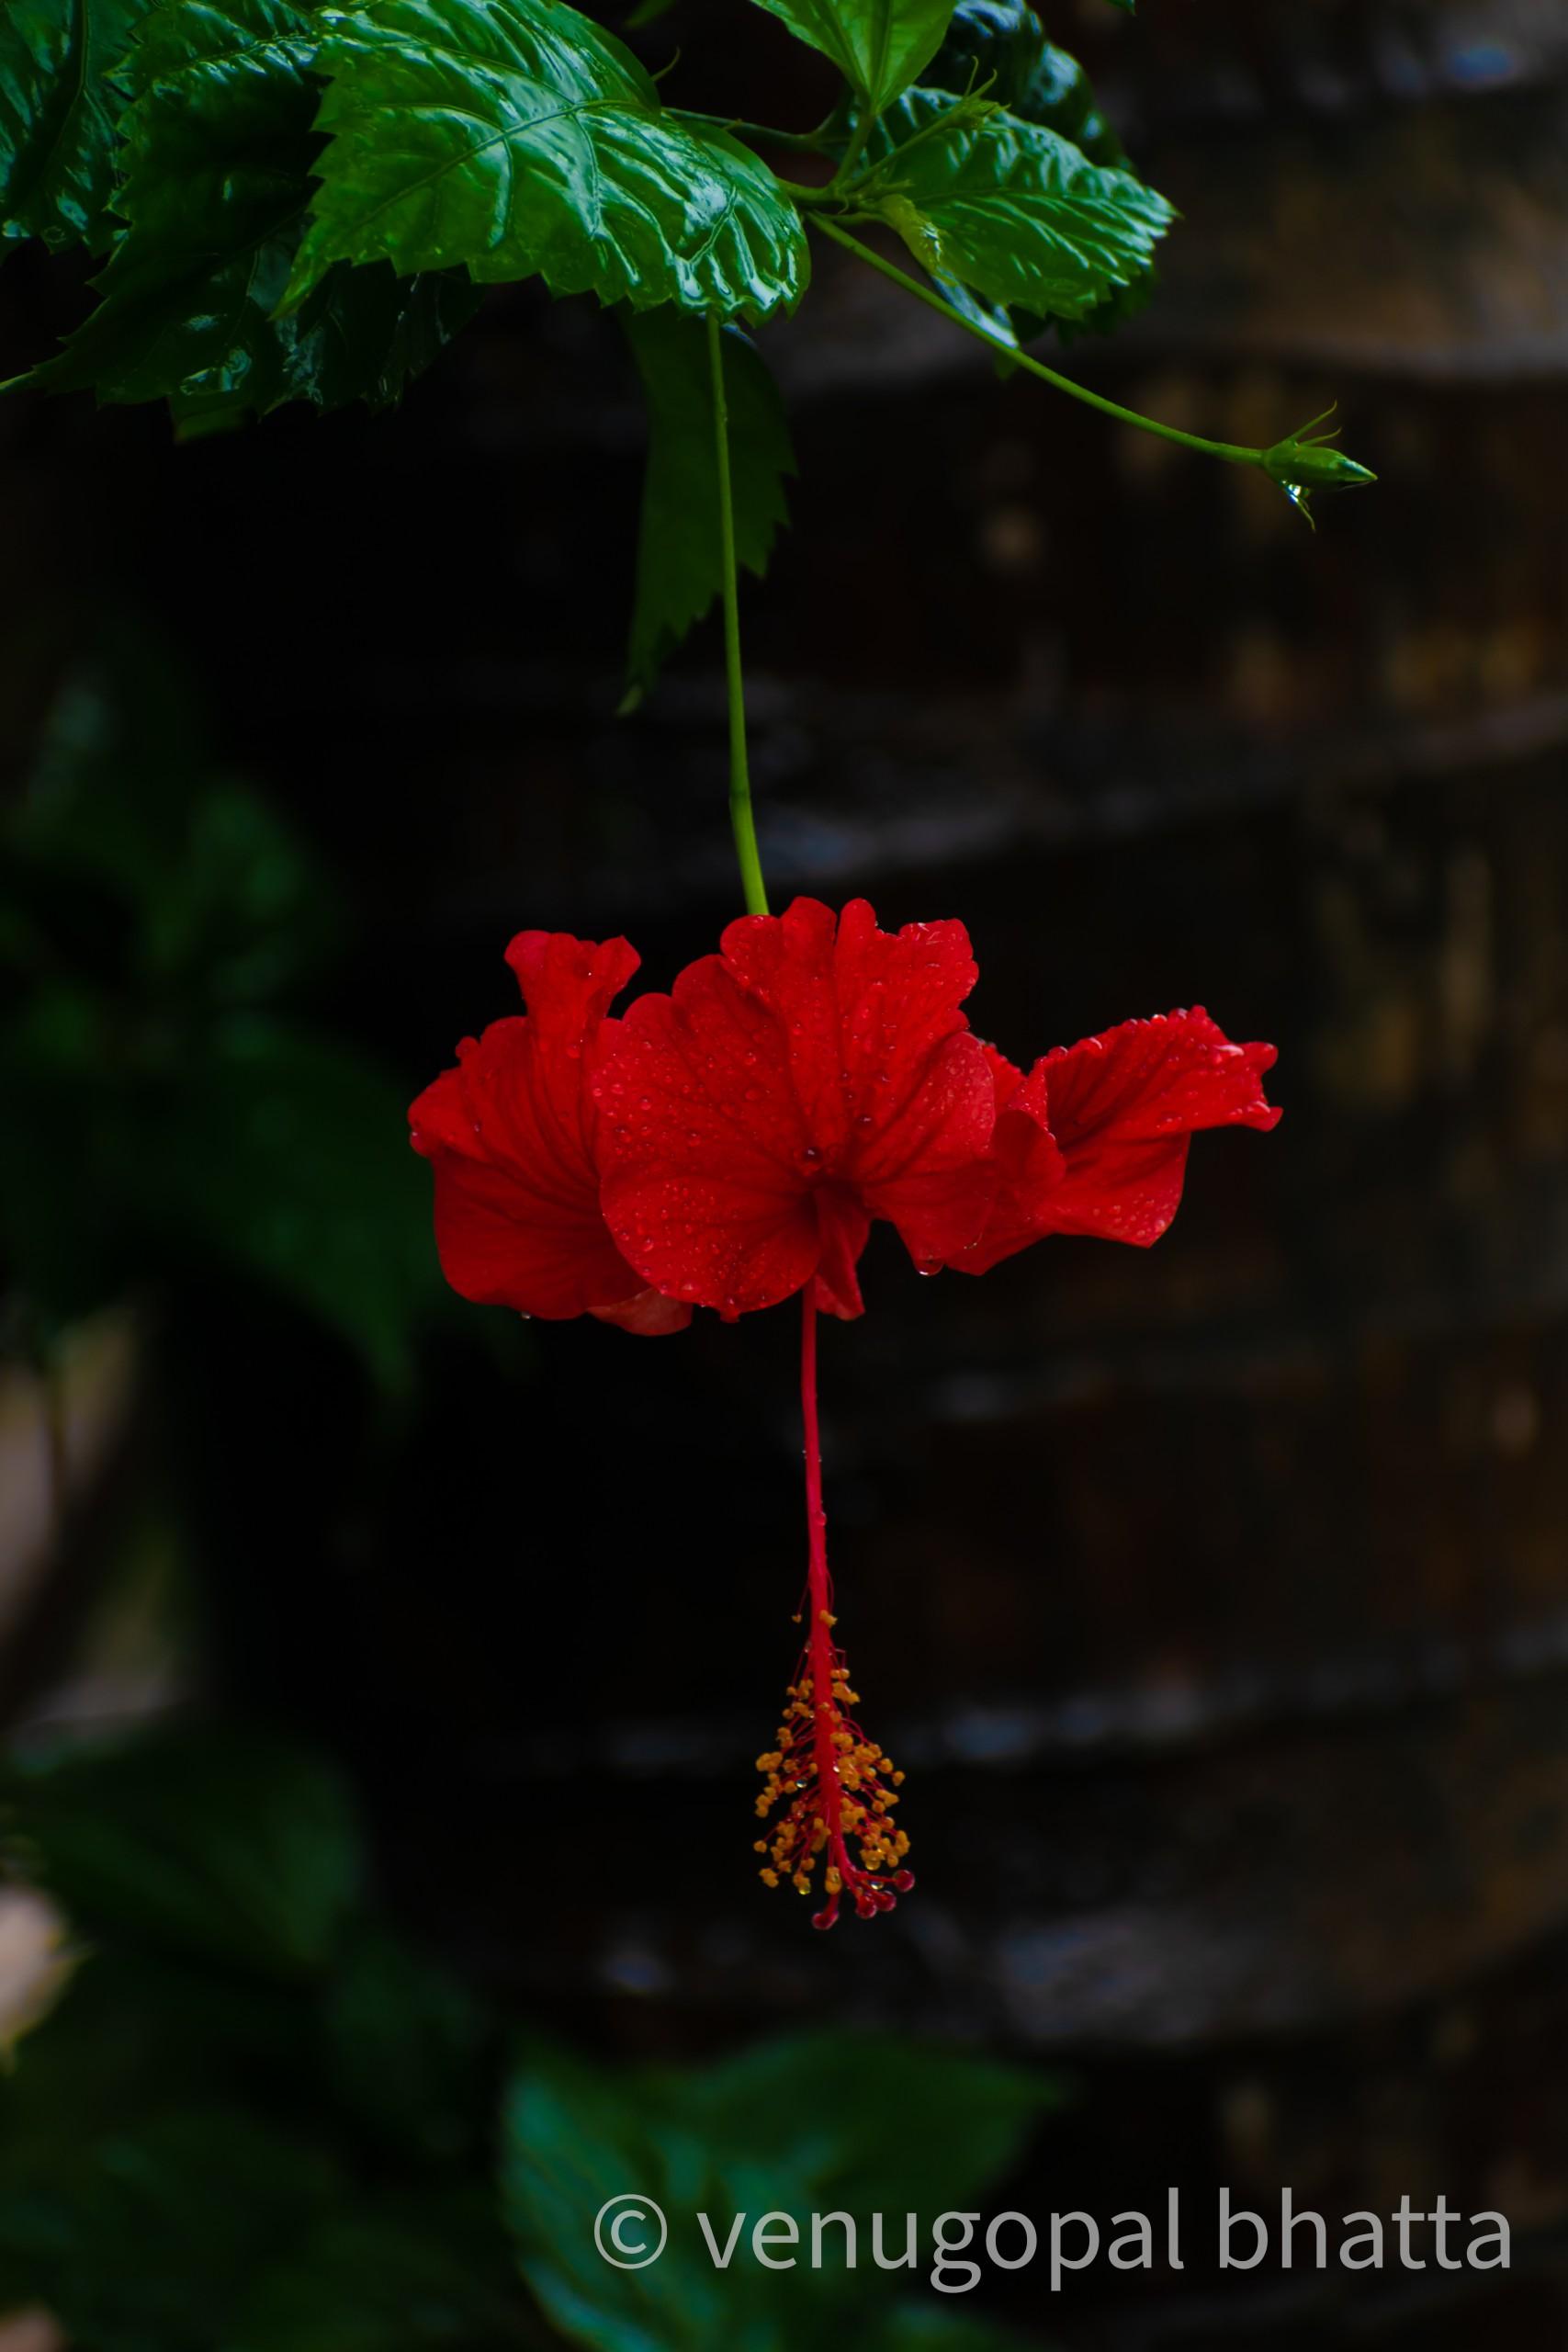 Red Flower on Focus